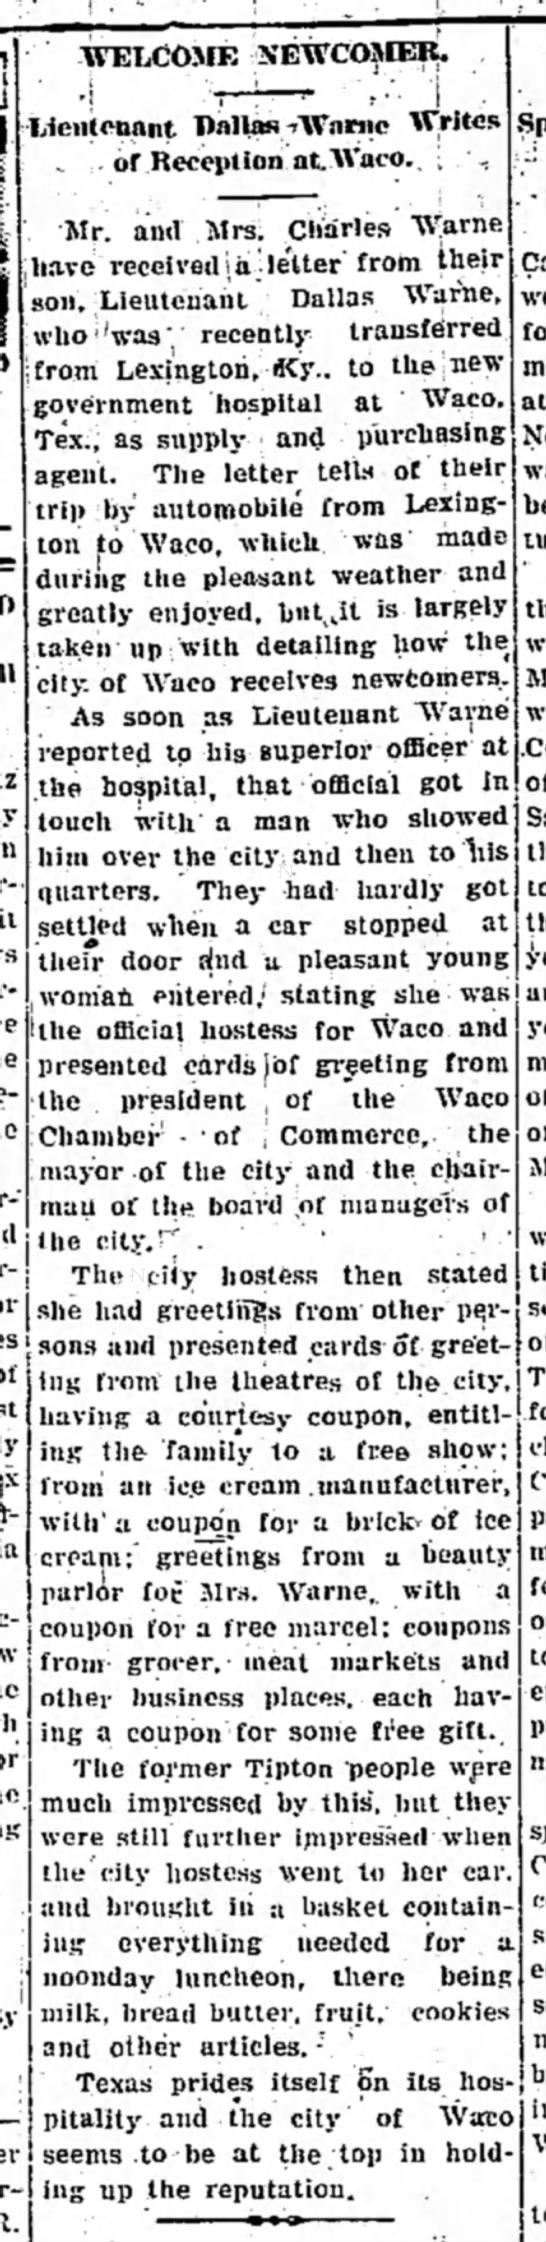 Tipton Daily Tribune 23 Mar 1932 pg 3 col 5 -